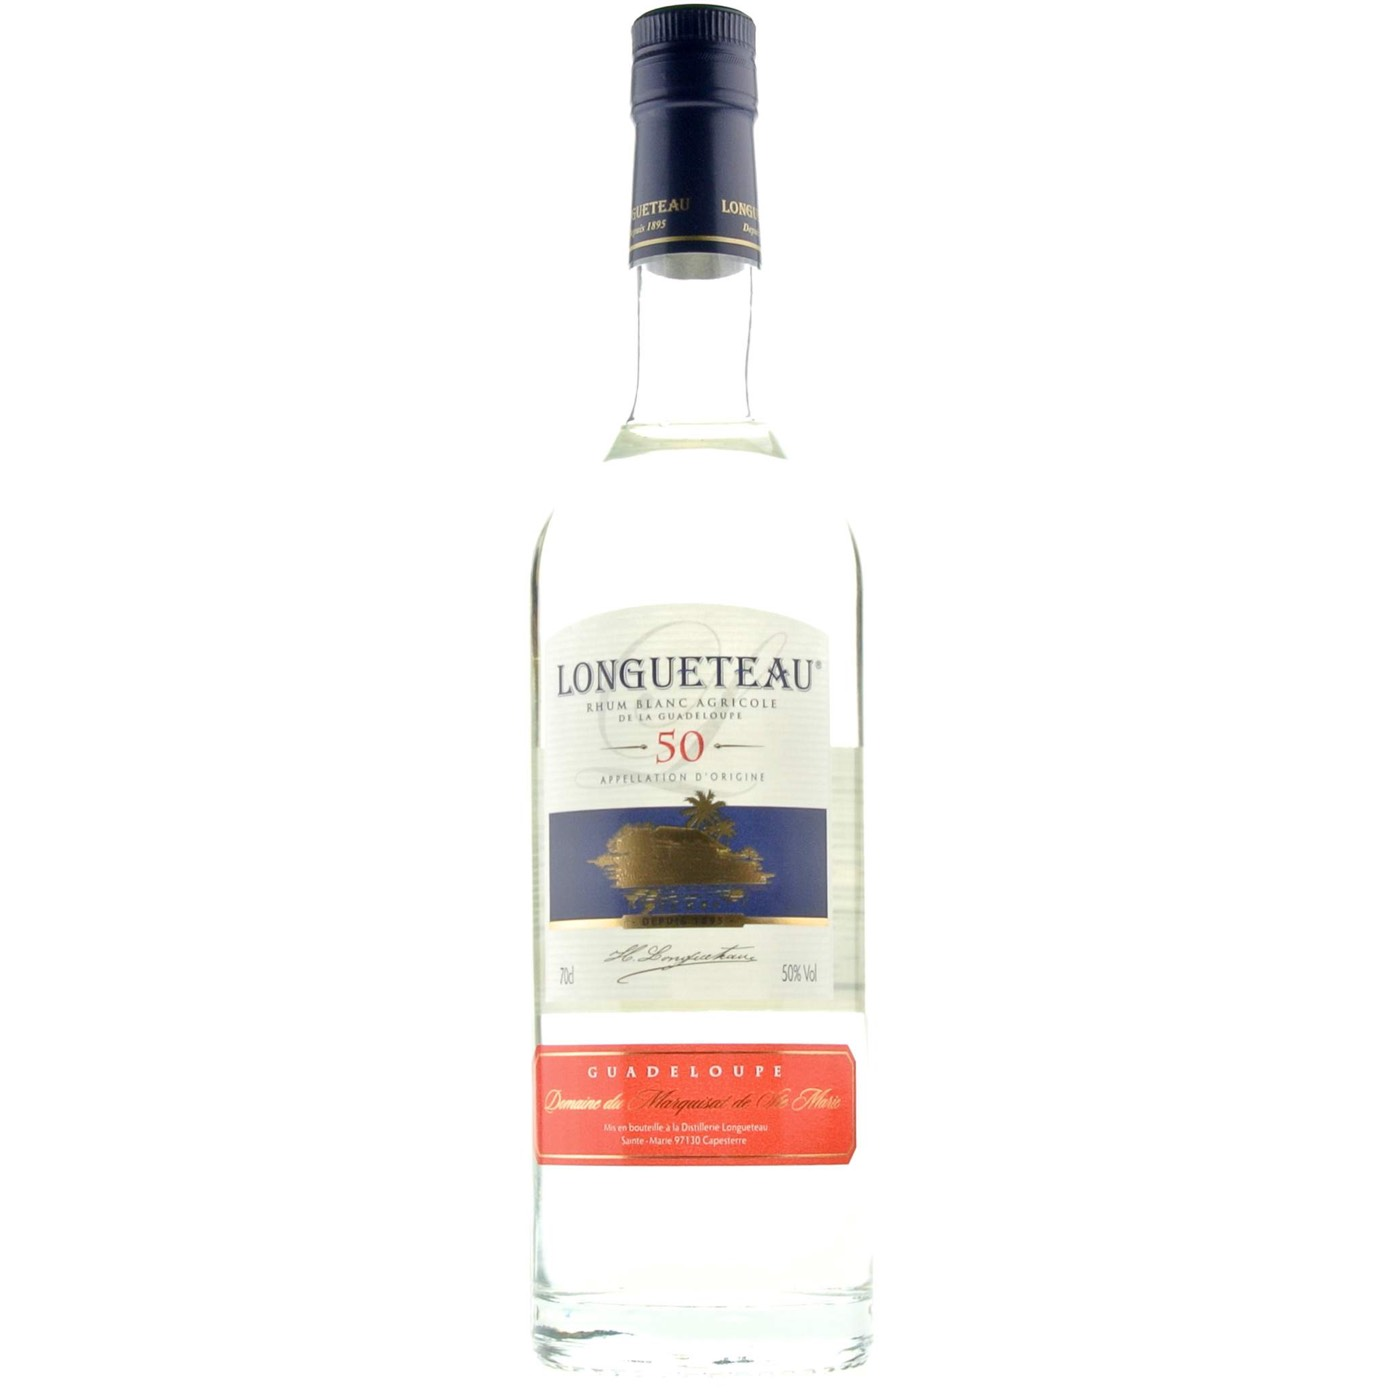 Bottle image of Longueteau Blanc 50